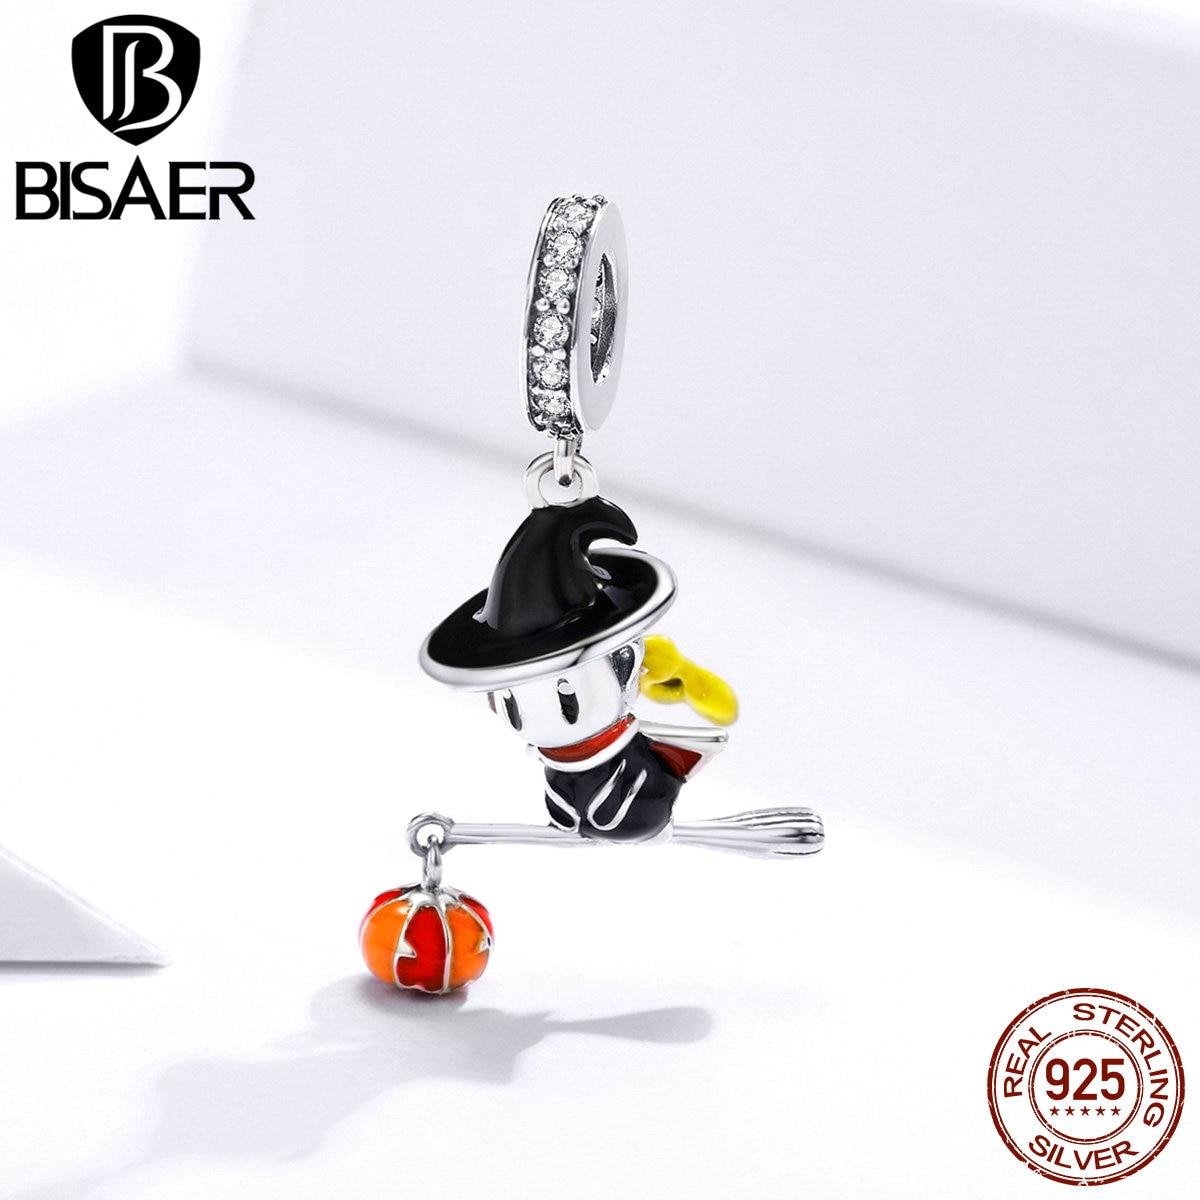 BISAER Magic Witch & Pumpkin Light Charm 925 Sterling Silver Black Enemal Pendant Bead For DIY Bracelet Necklaces Jewelry EFC240